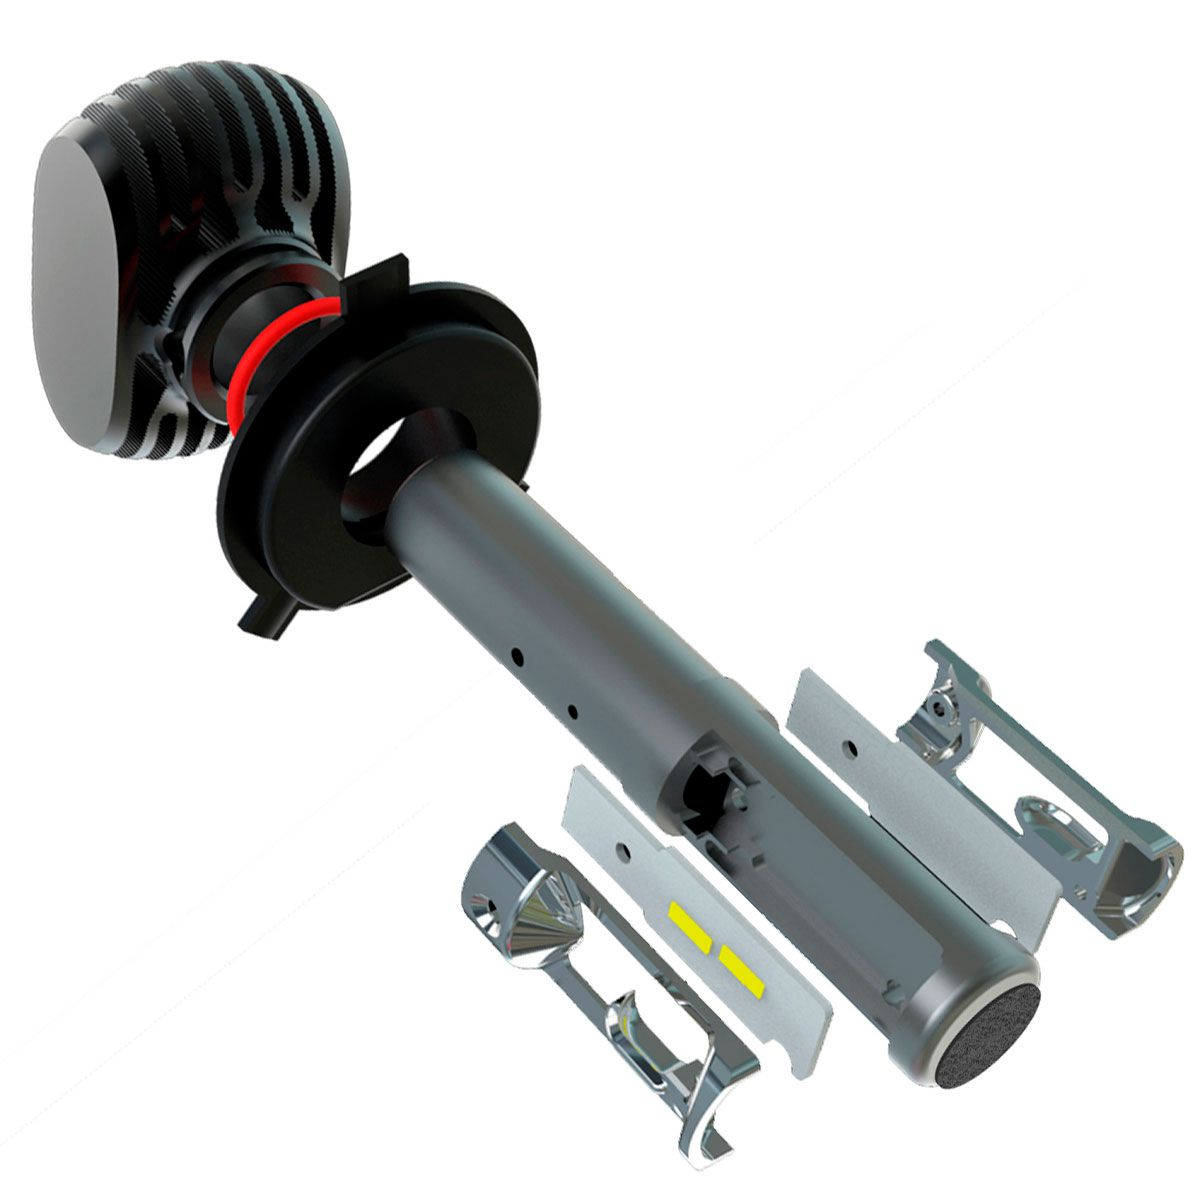 Kit Ultra LED Gol G6 2013 2014 2015 2016 tipo xenon farol alto e baixo H4 e milha H11 50W